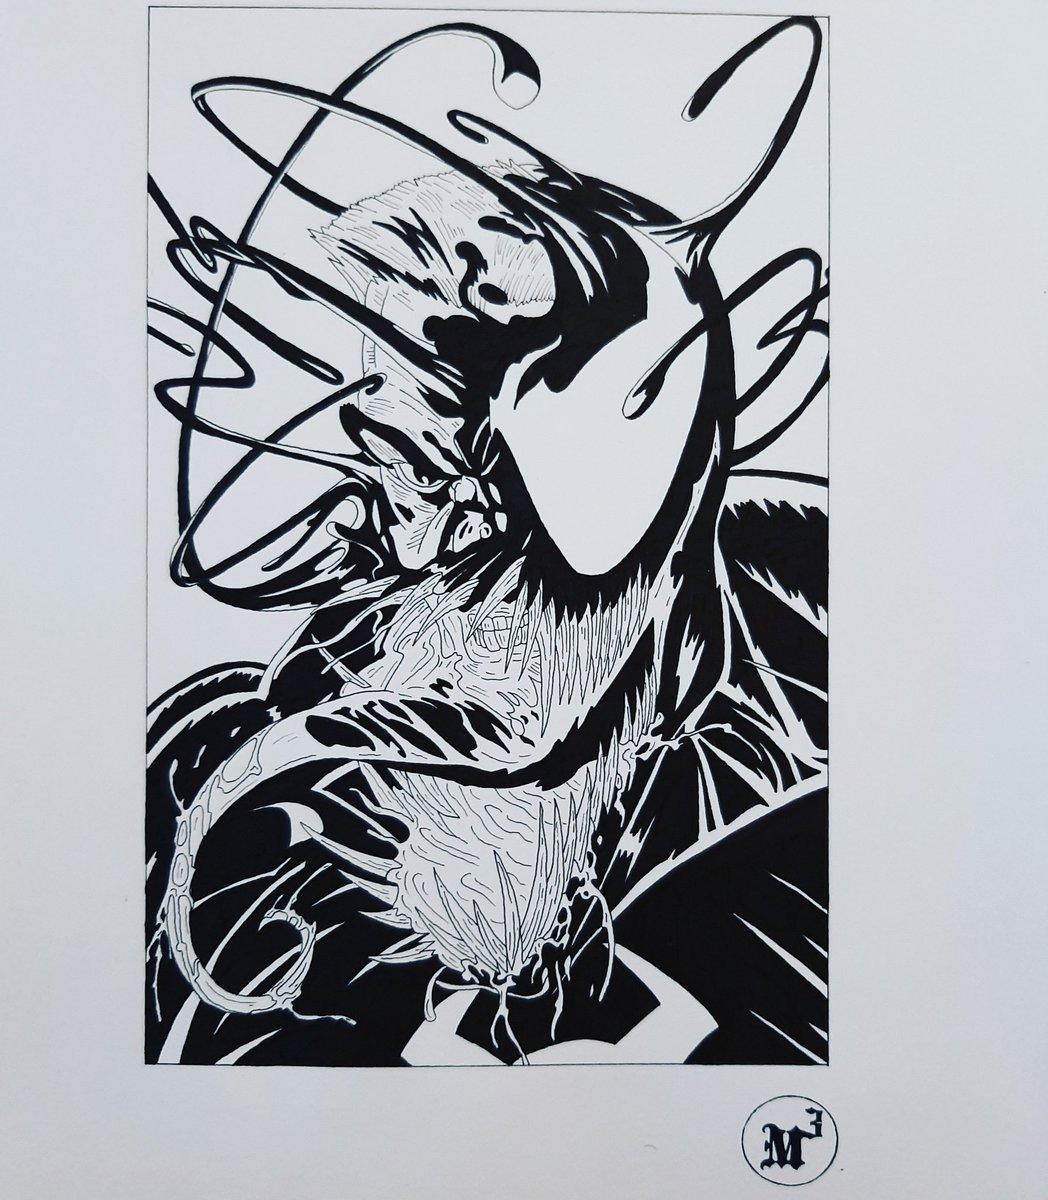 Venom Fan Art  #sketch #sketchbook #draw #drawing #dibujo #pen #ink #pencil #art #arte #artista #artwork #artist #artsy #black #blackwork #blackandwhite #fanart #marveluniverse #marvel #venom #hero #comic #barcelona #catalunya https://t.co/4CwZO9qthh